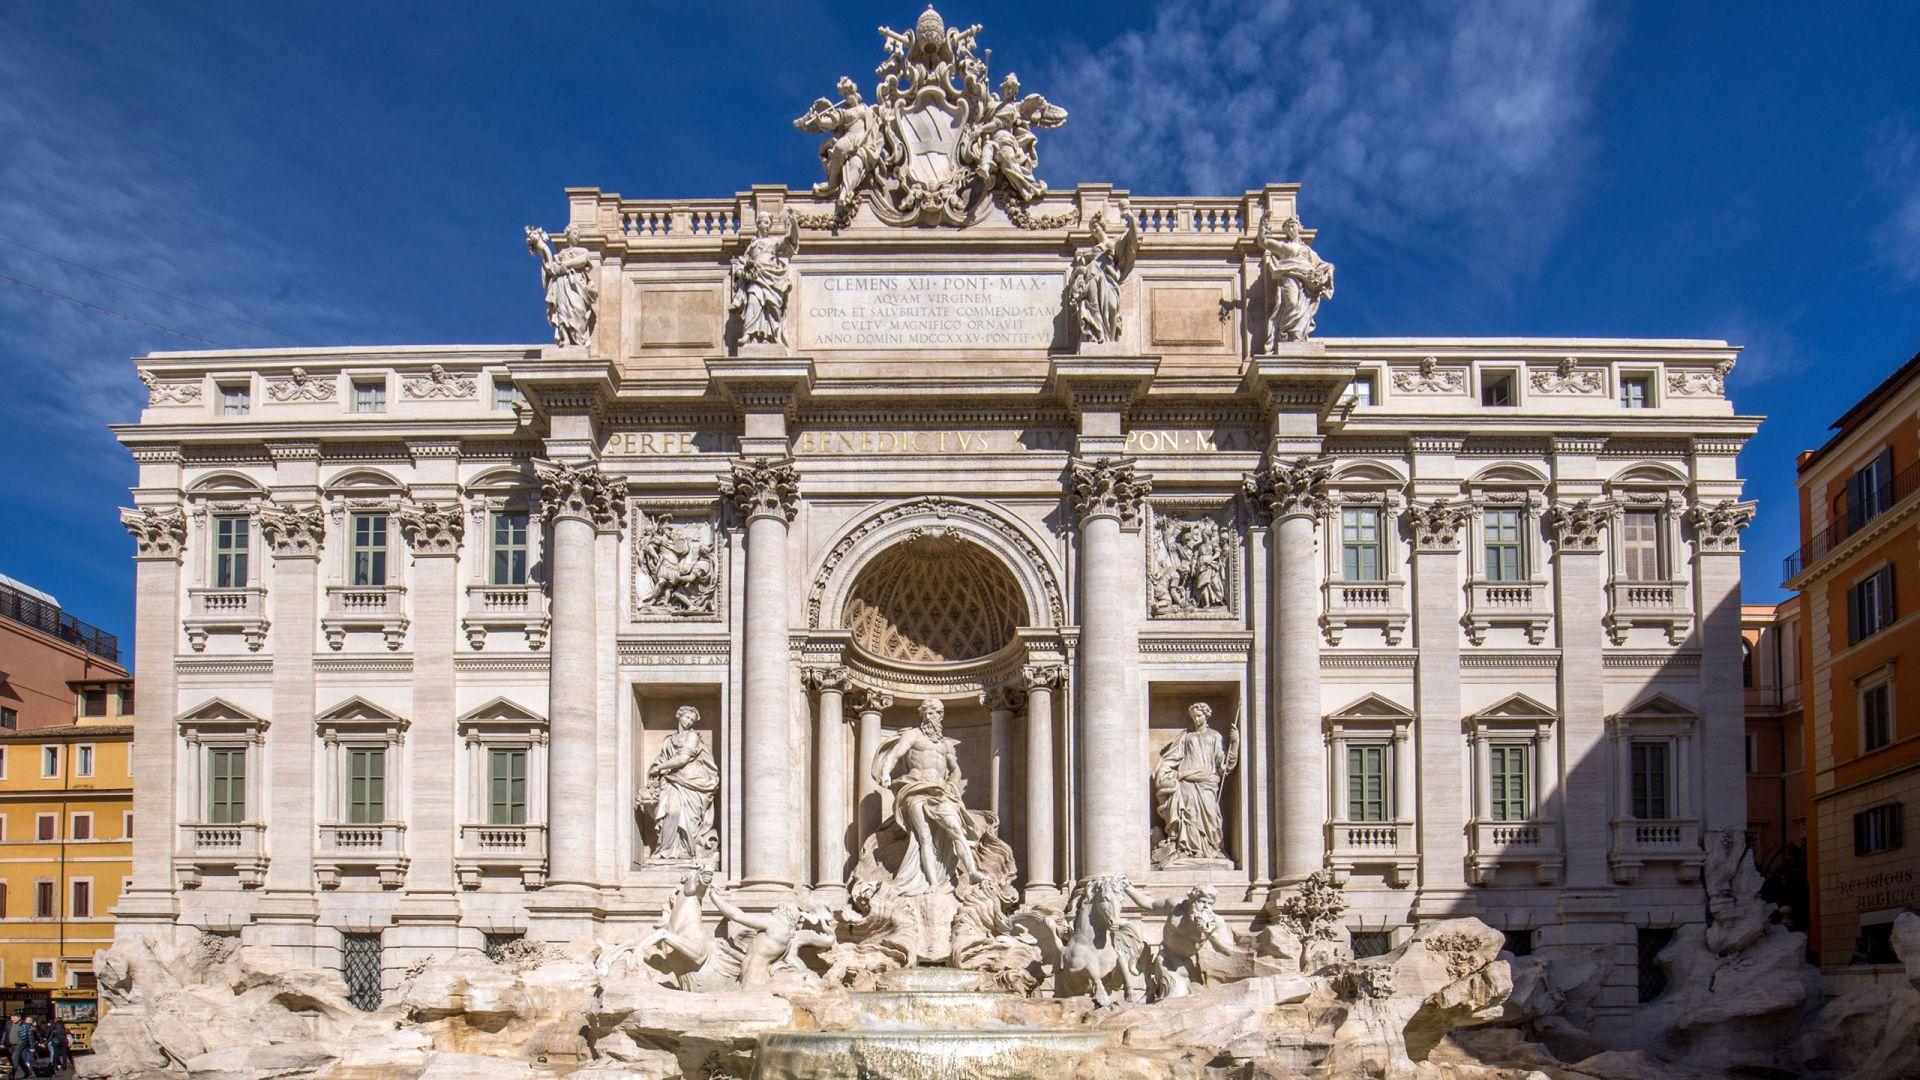 albergo-ottocento-rome-monuments-05